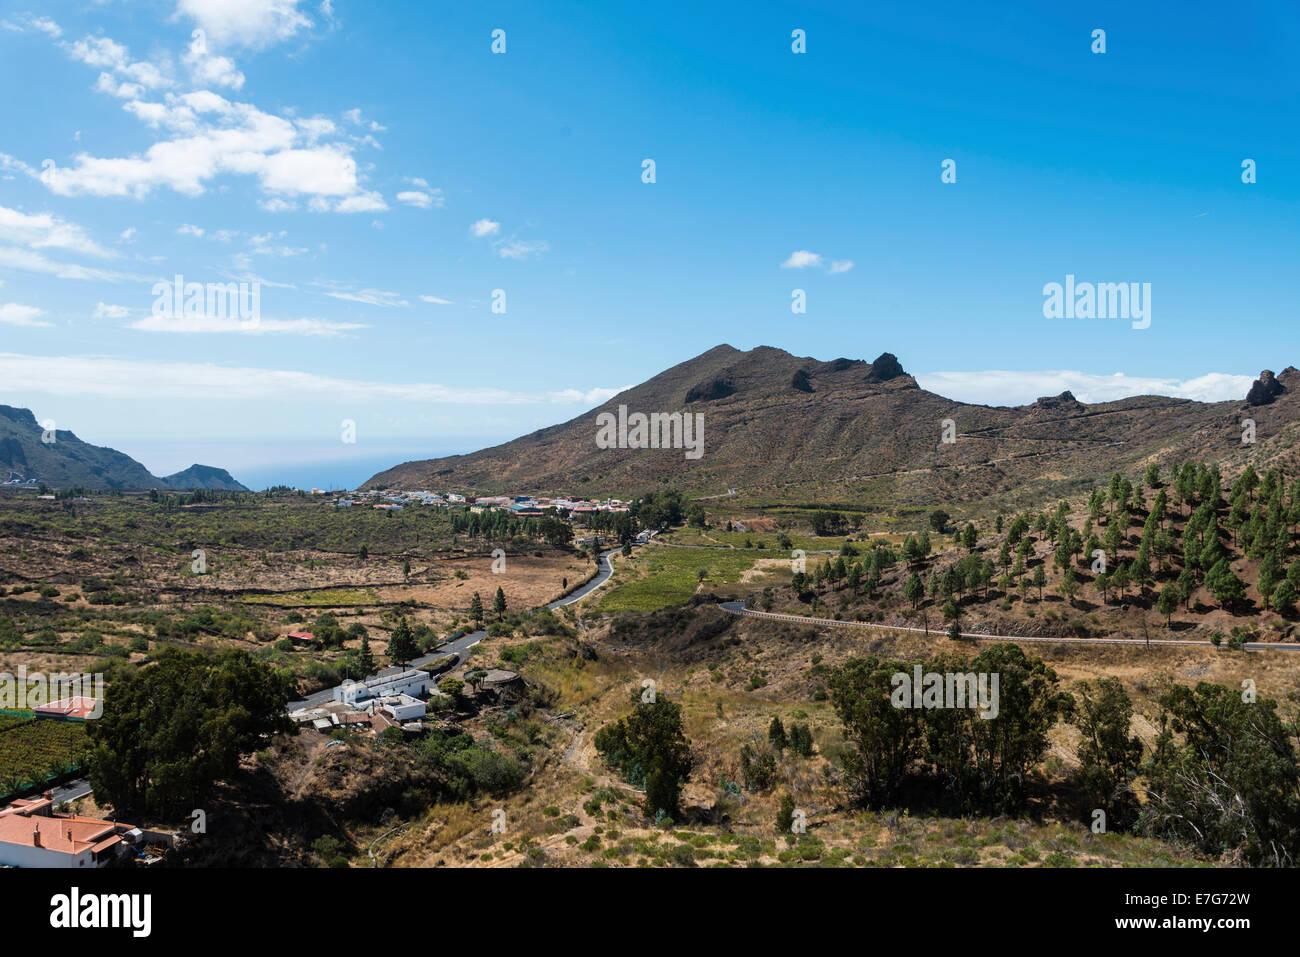 Vulkanlandschaft, Santiago del Teide, Teneriffa, Kanarische Inseln, Spanien Stockbild